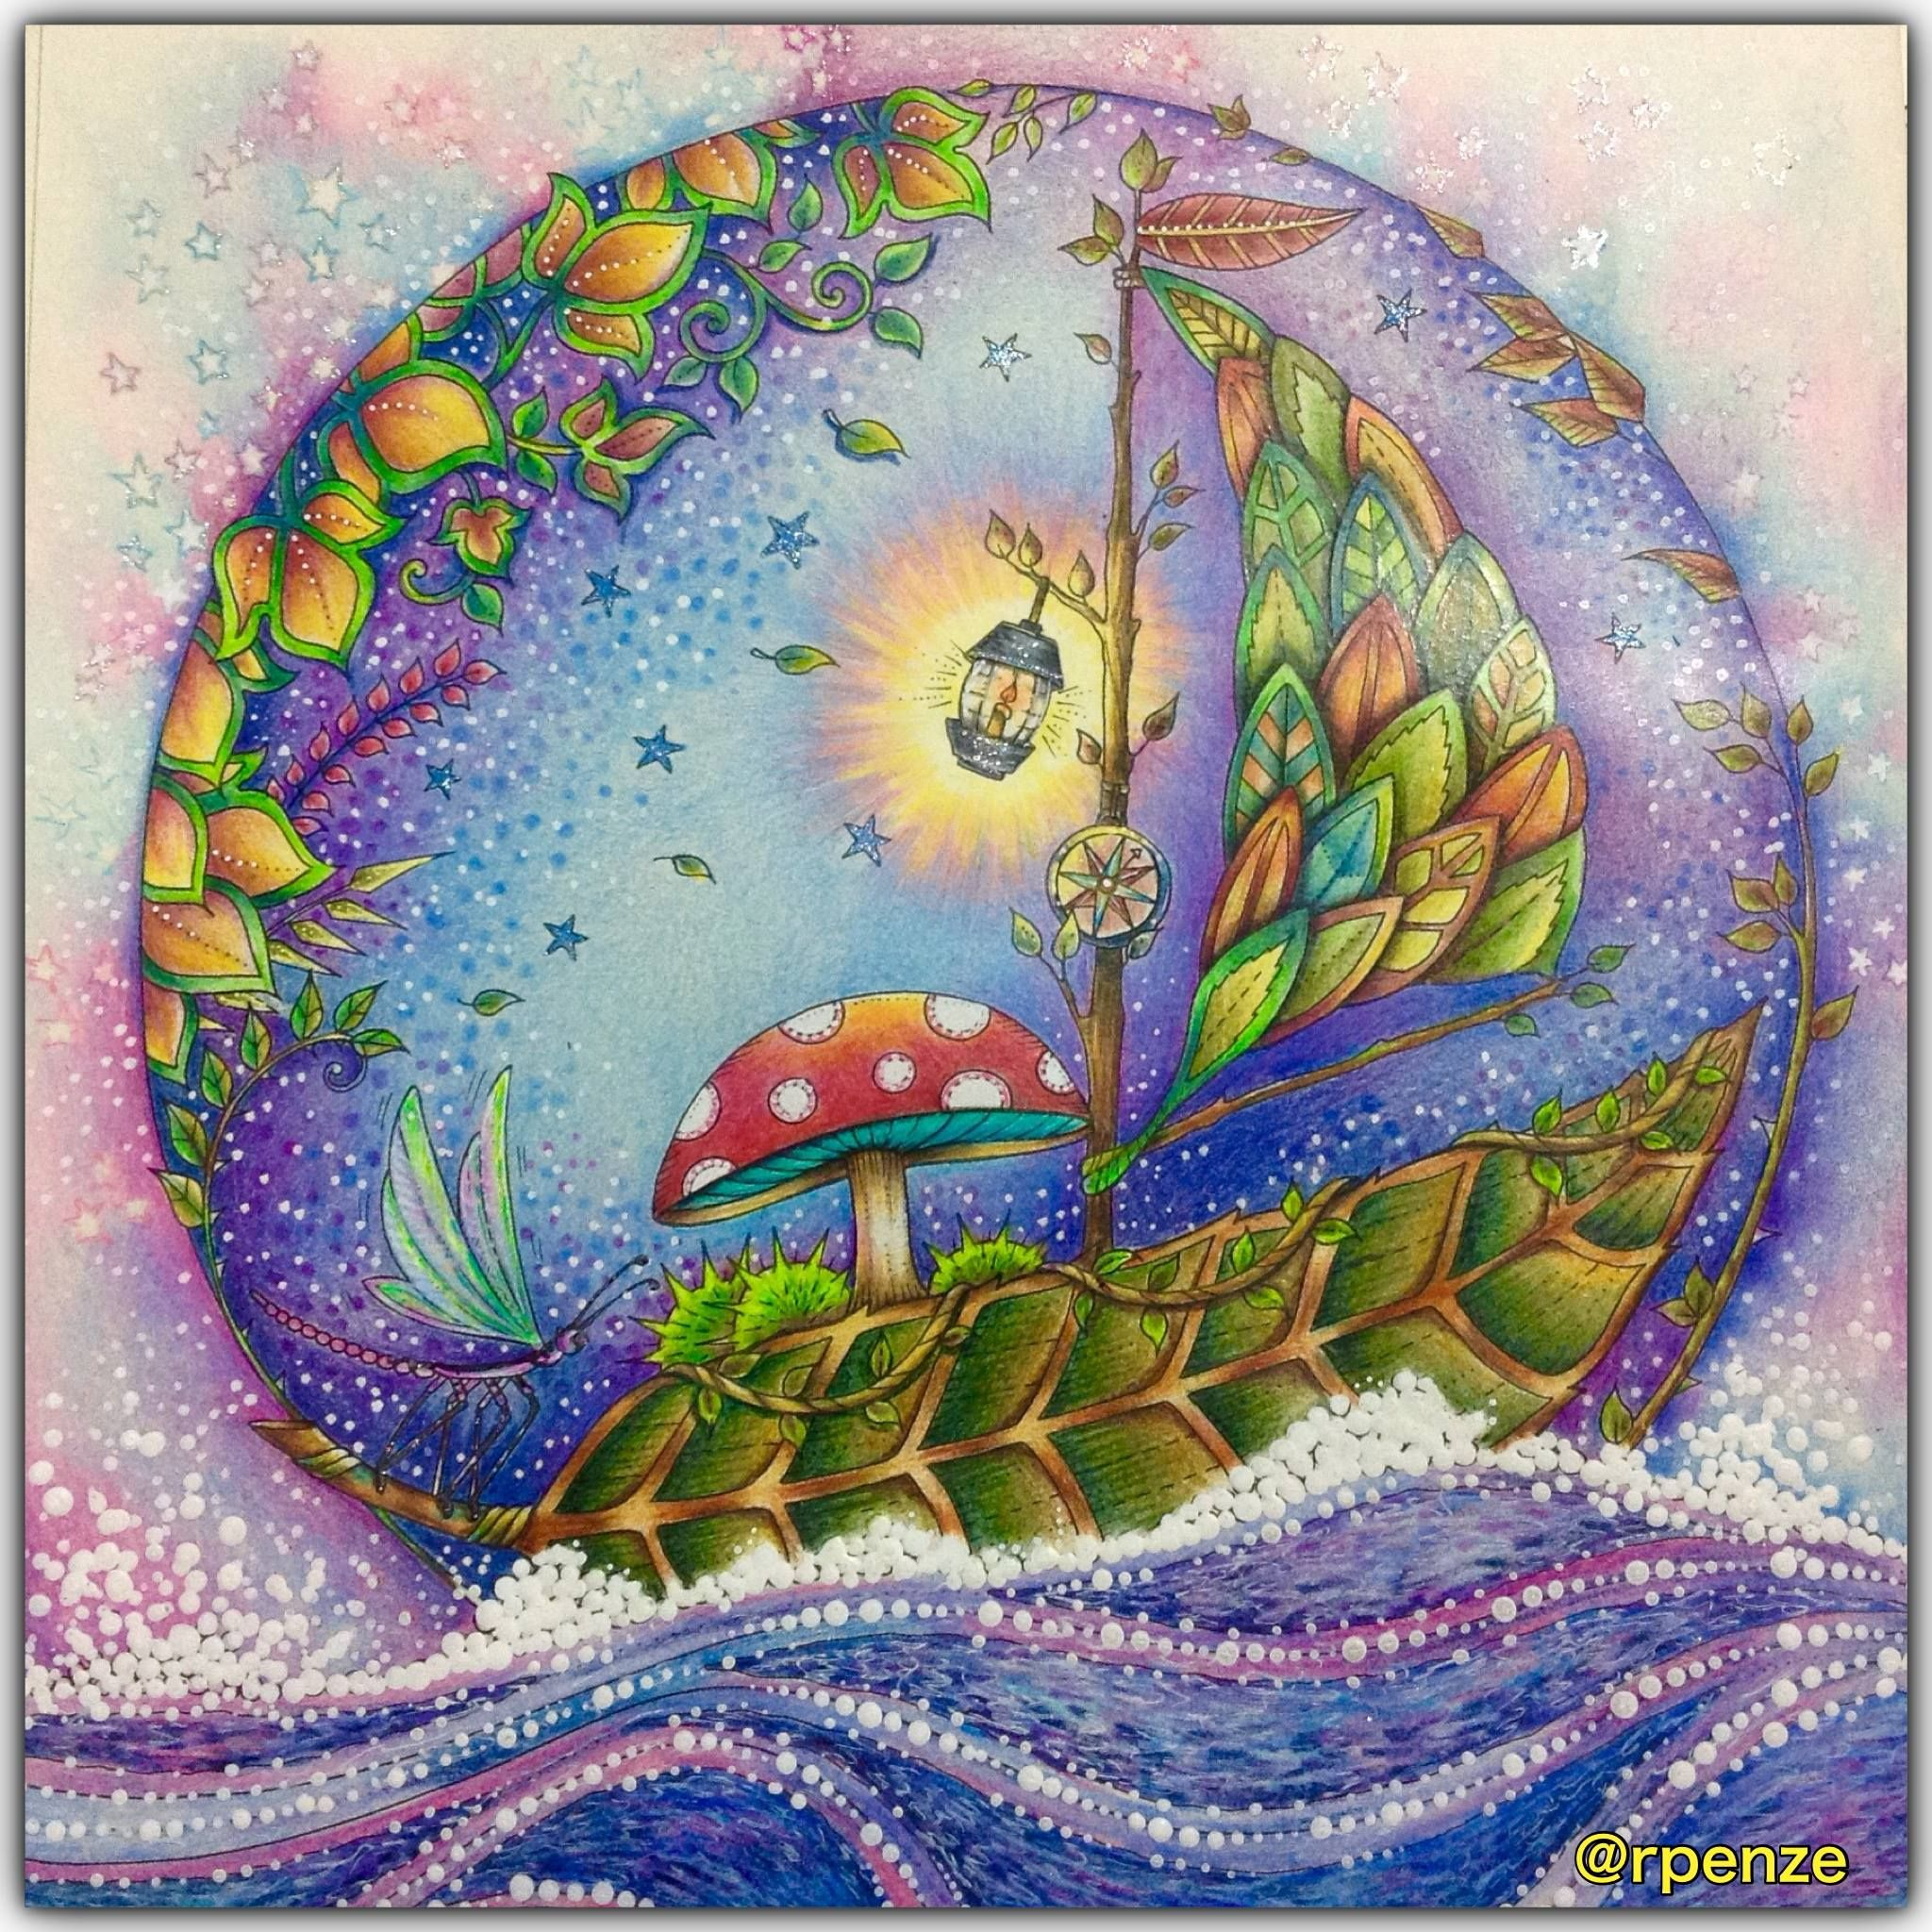 Enchanted Forest Coloring BookRosana Penze